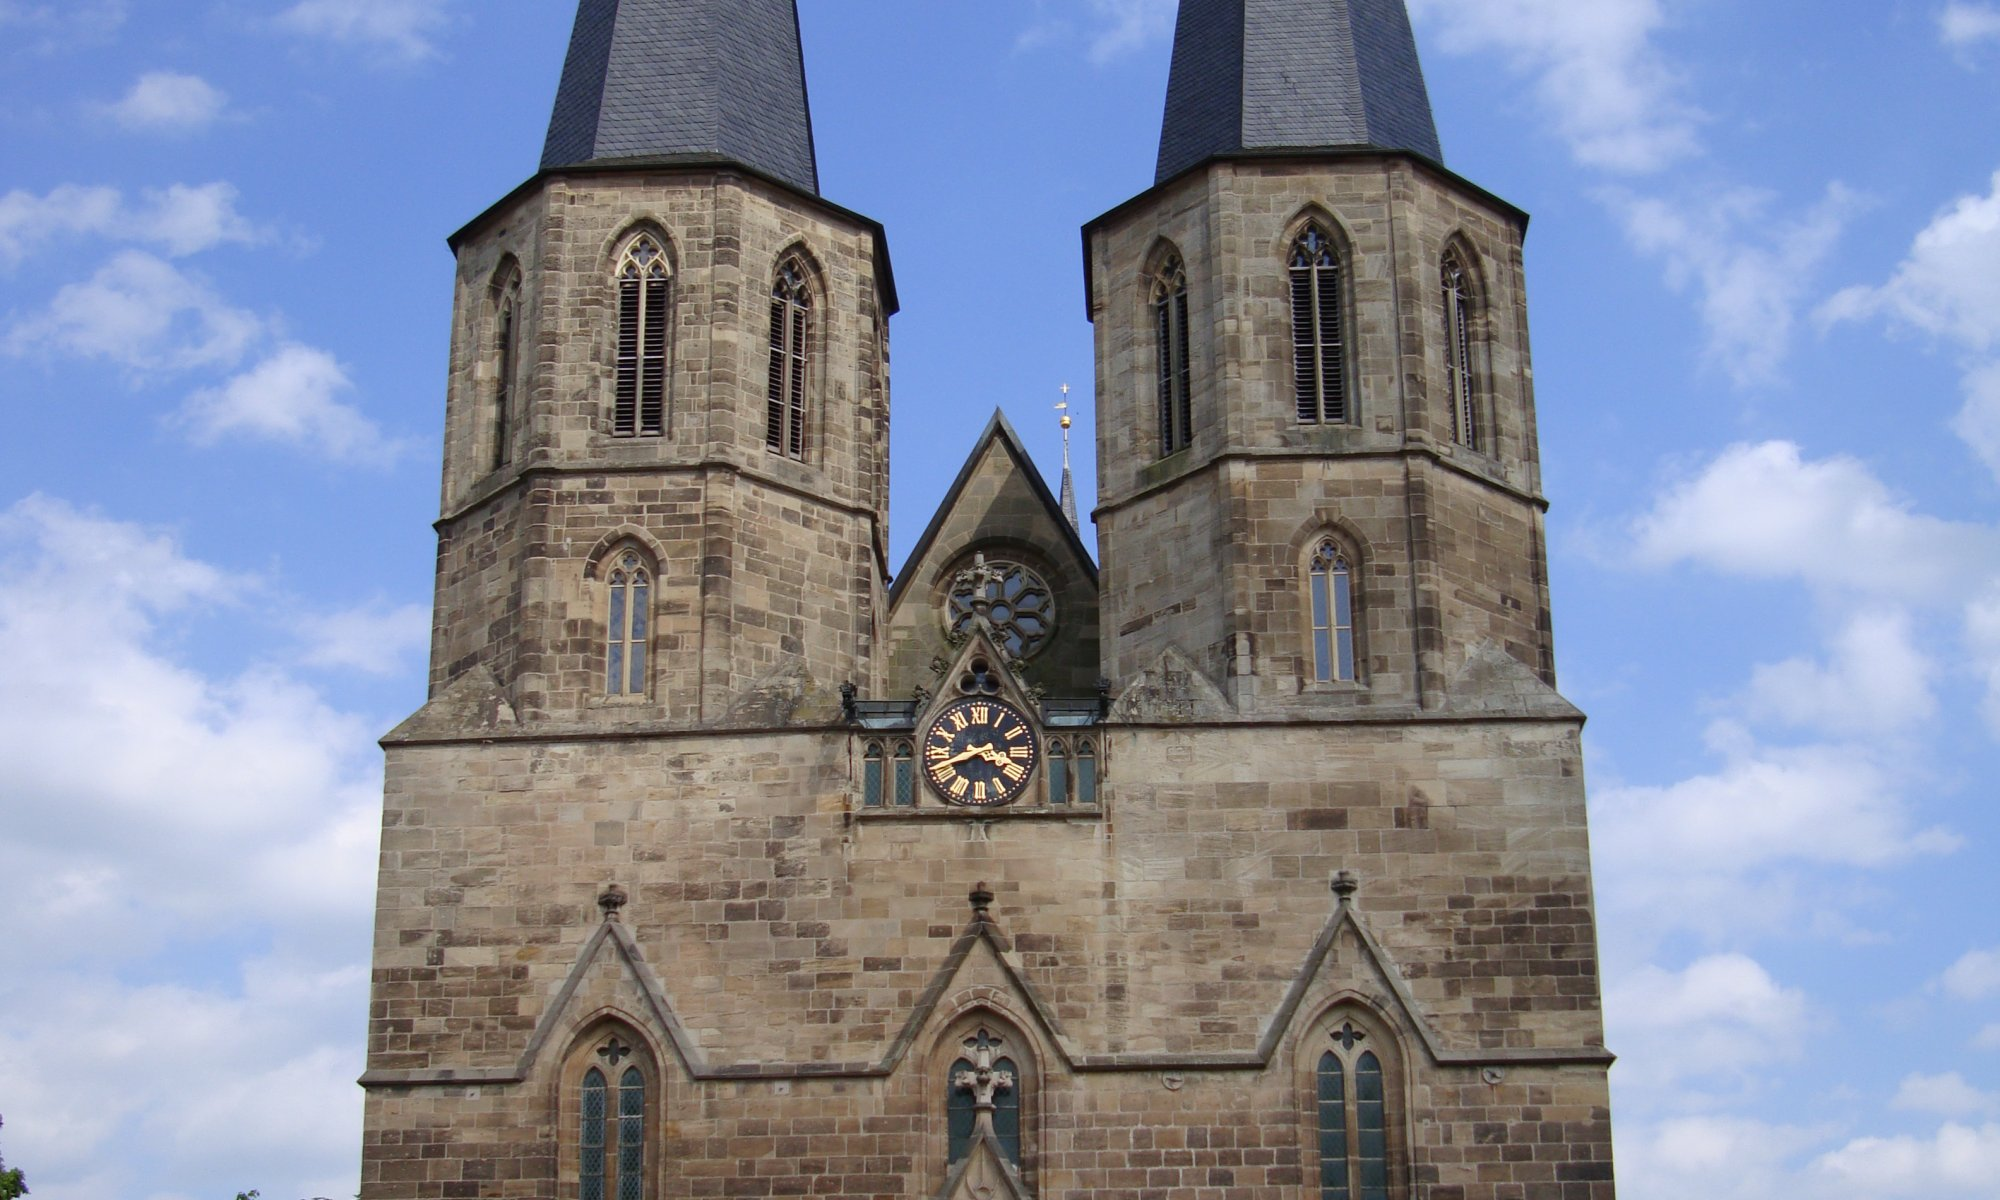 St. Cyriakus, Duderstadt